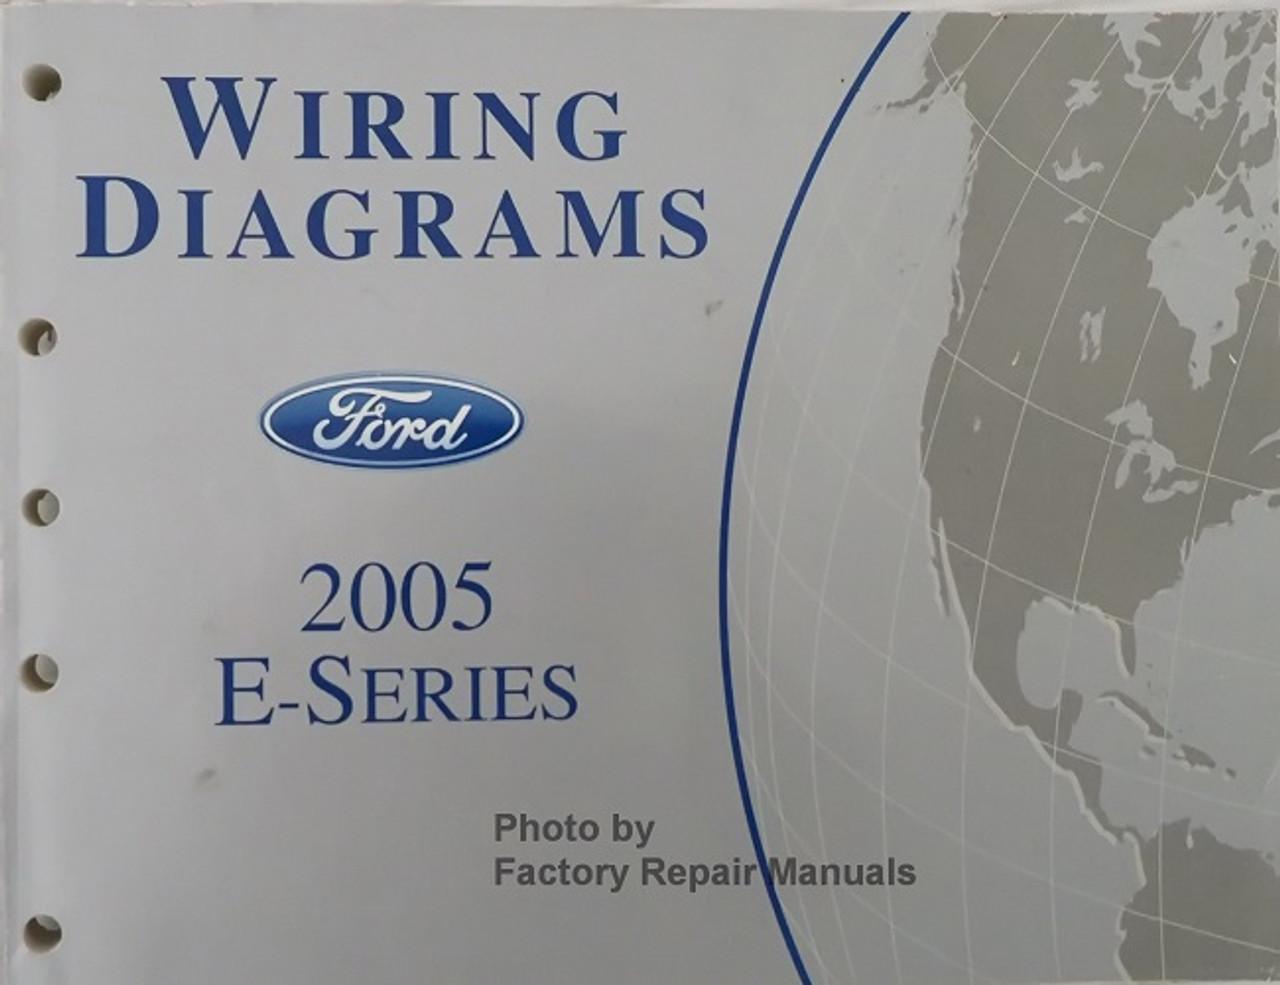 2005 Ford E150 E250 E350 E450 Econoline Van Club Wagon Electrical Wiring  Diagram Manual - Factory Repair ManualsFactory Repair Manuals